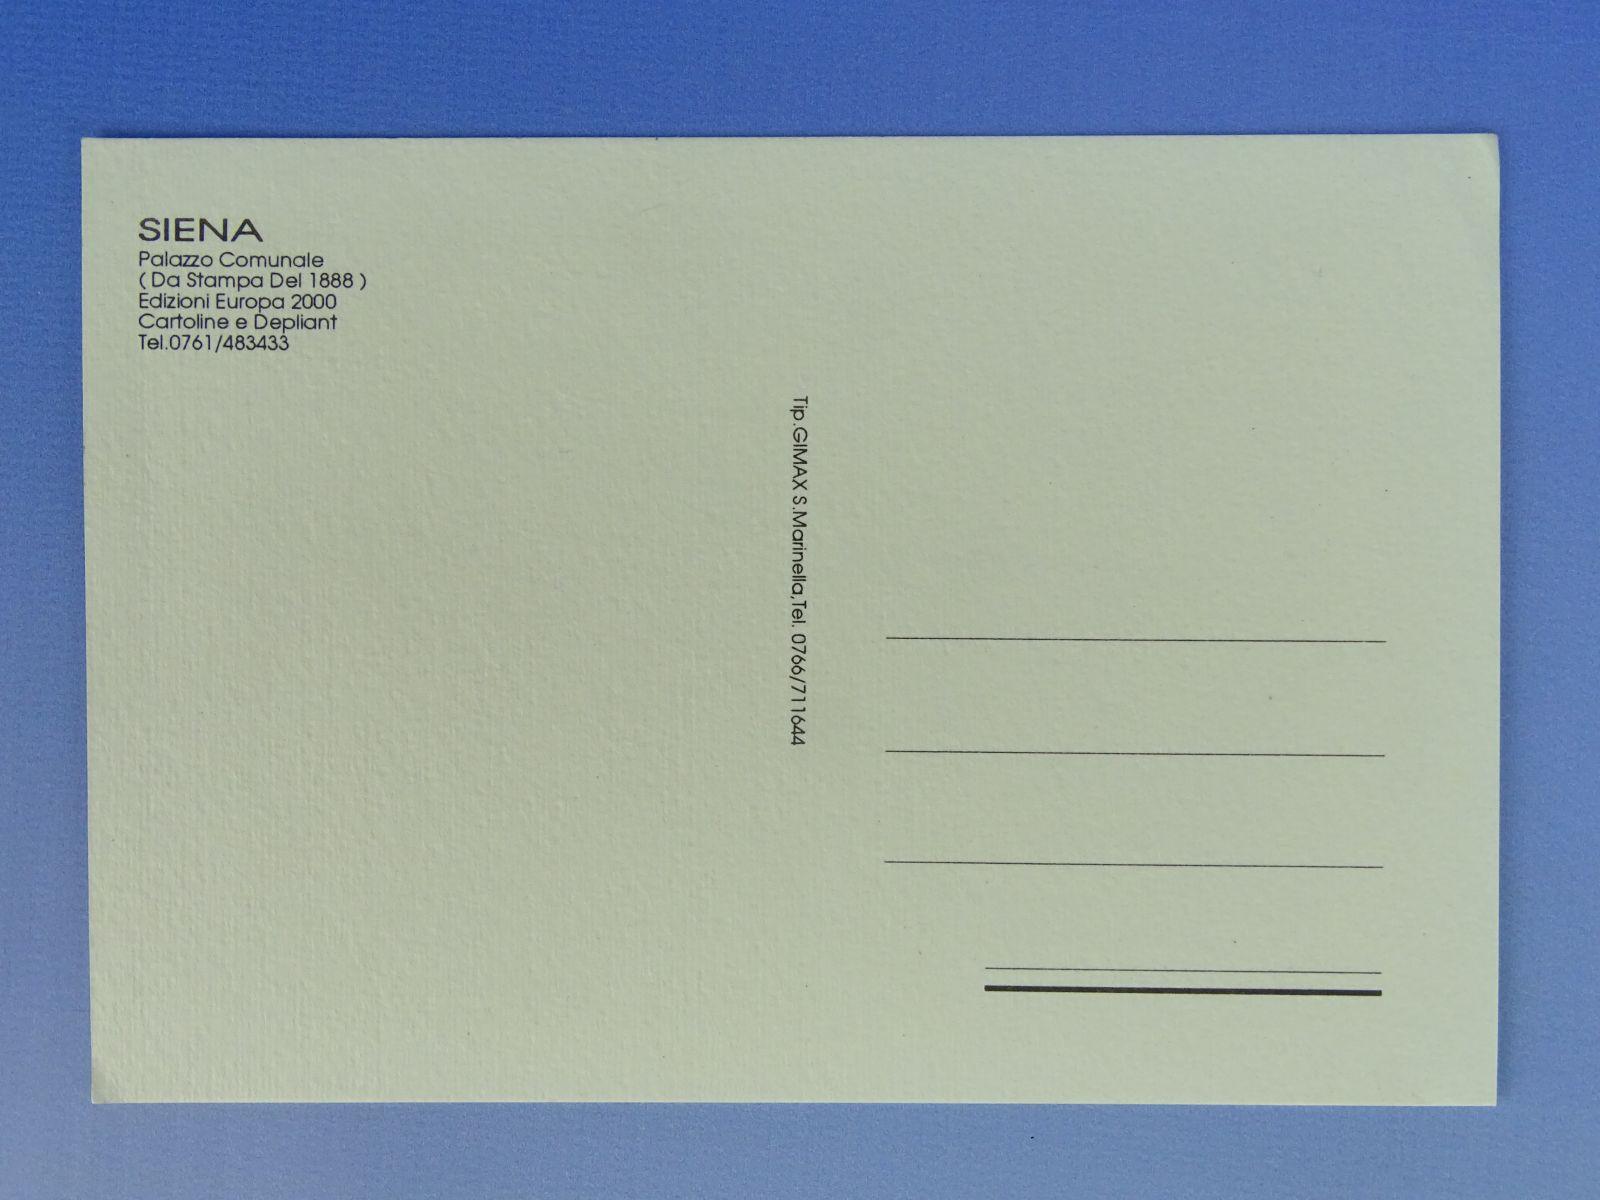 DSC07284.JPG (1600�1200)